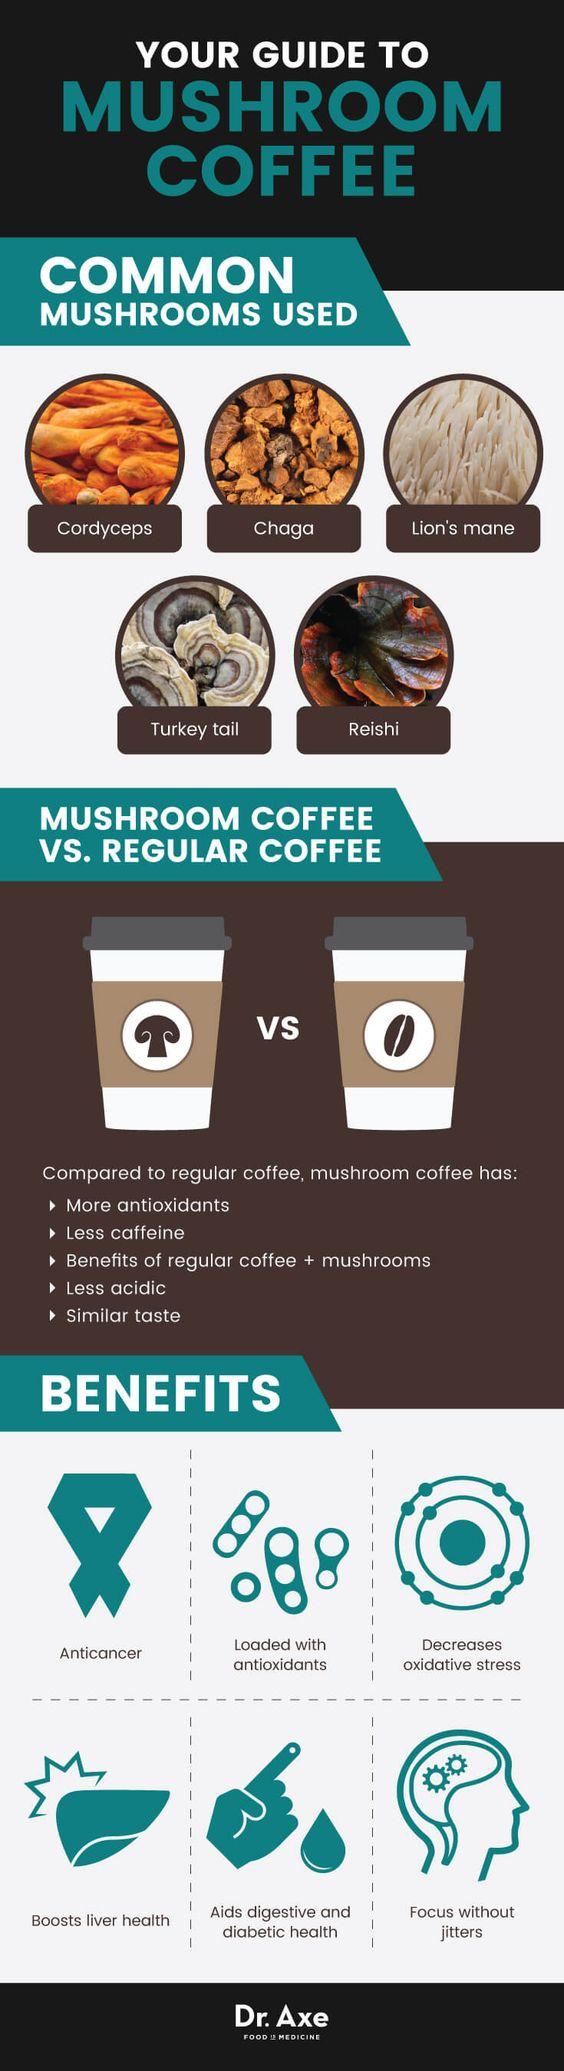 Guide to mushroom coffee